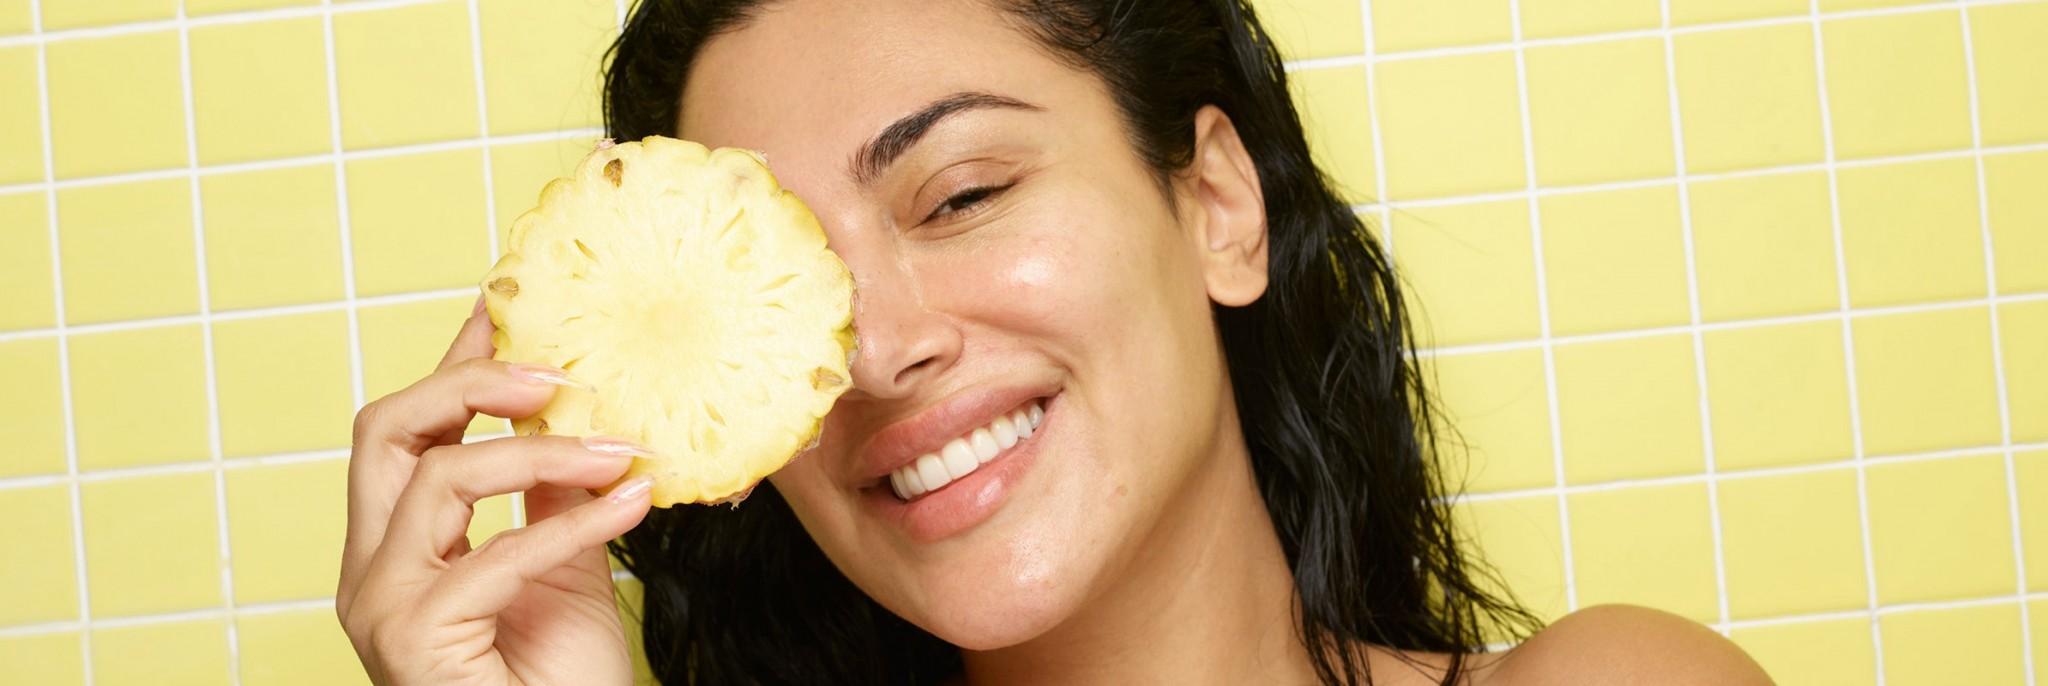 A Skincare Line by Huda Kattan Is No Longer Wishful Thinking